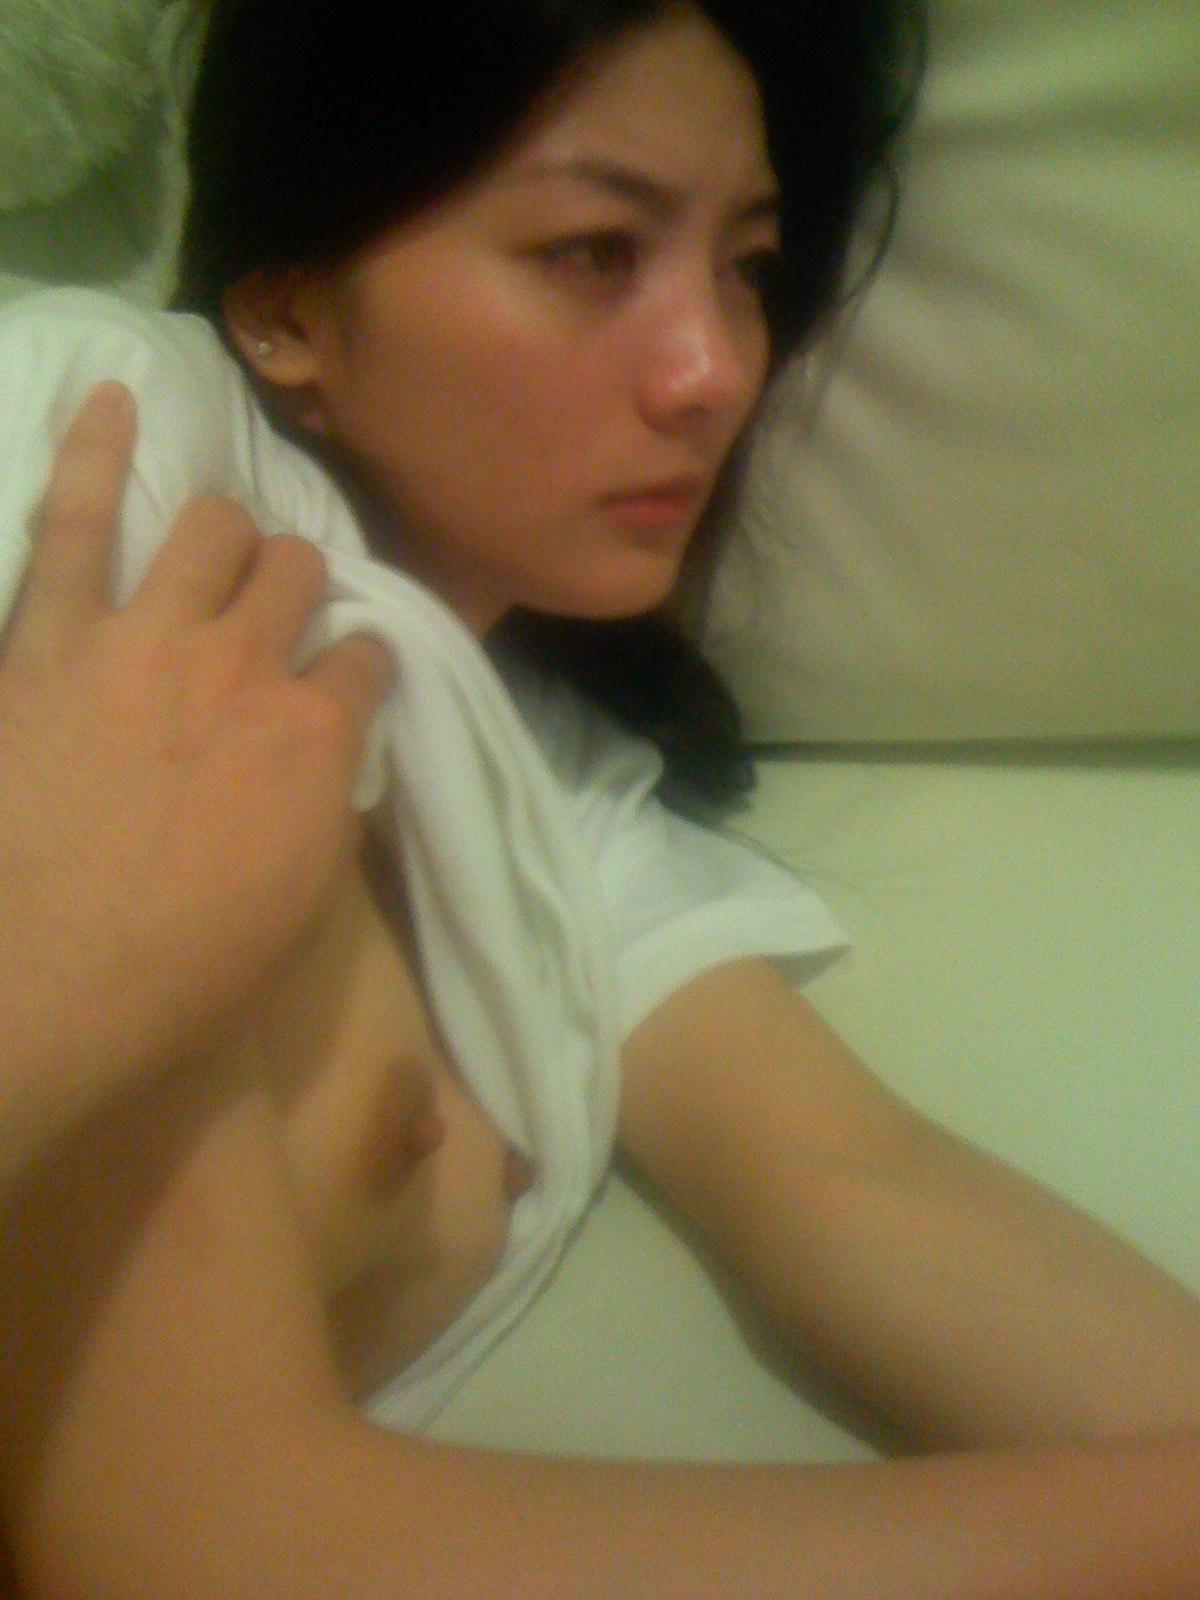 asian celebrity sex scandalamiture asian porn